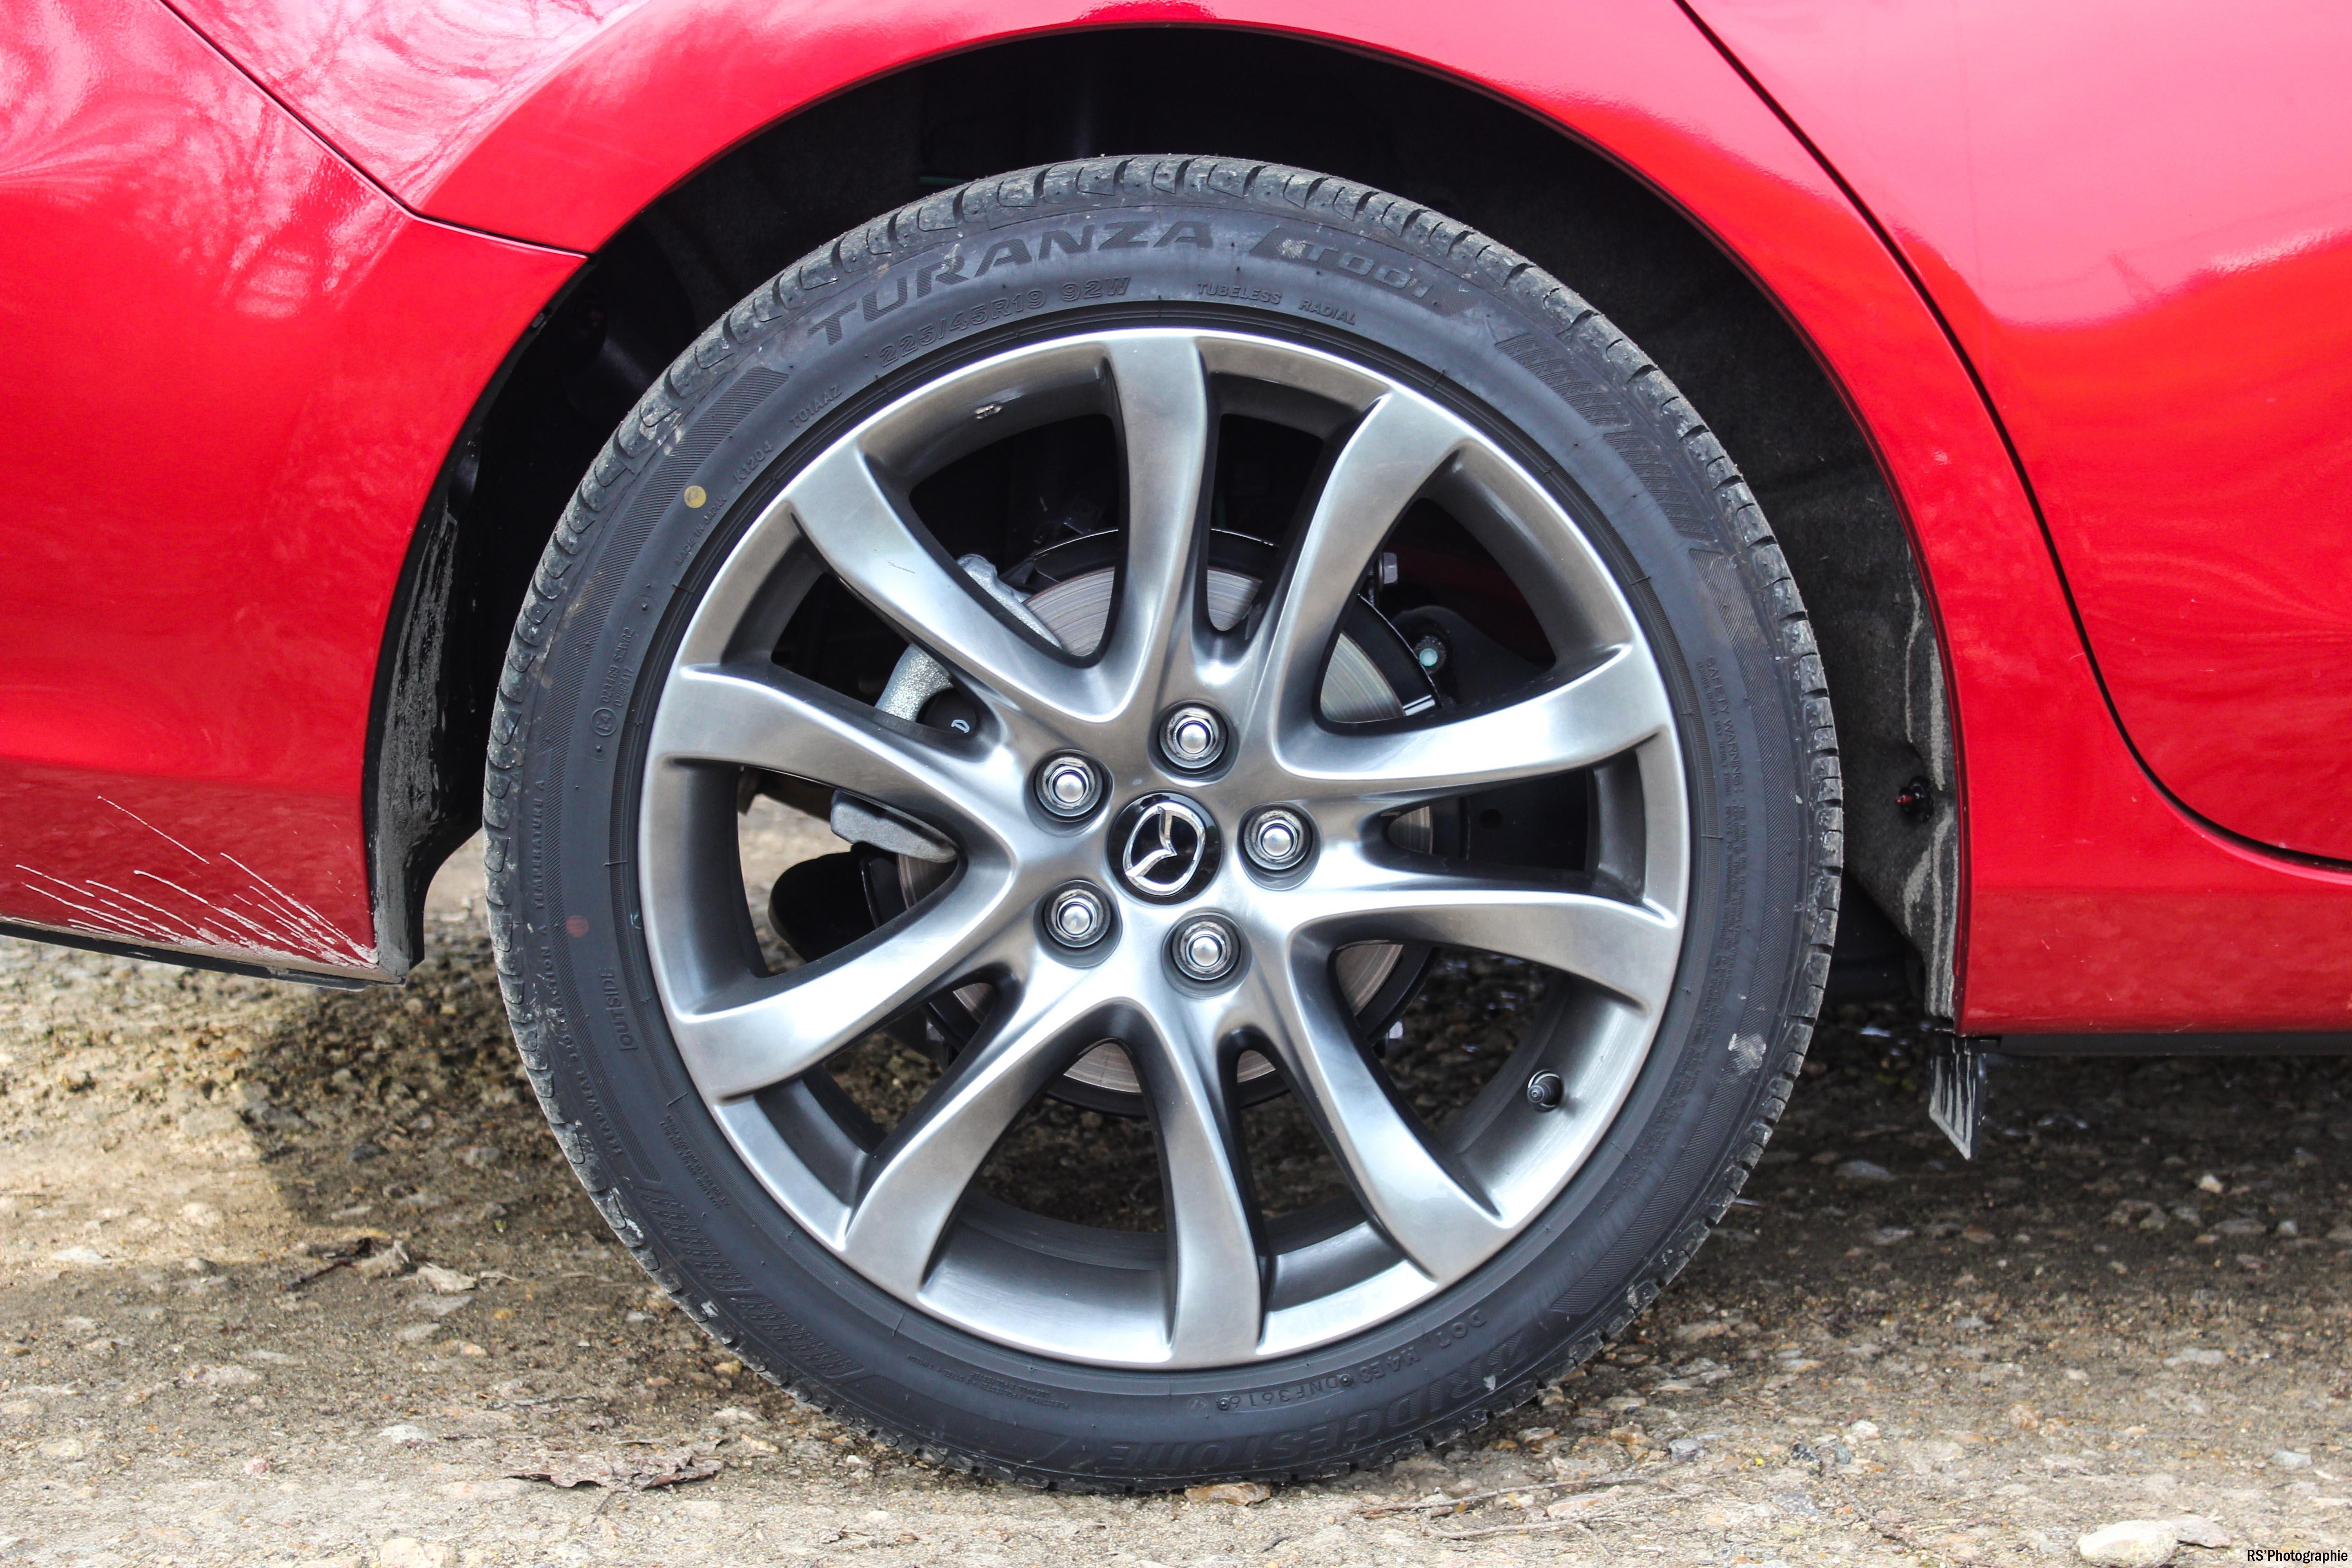 Mazda6SW30-mazda-6-sw-jante-rim-arnaud-demasier-rsphotographie